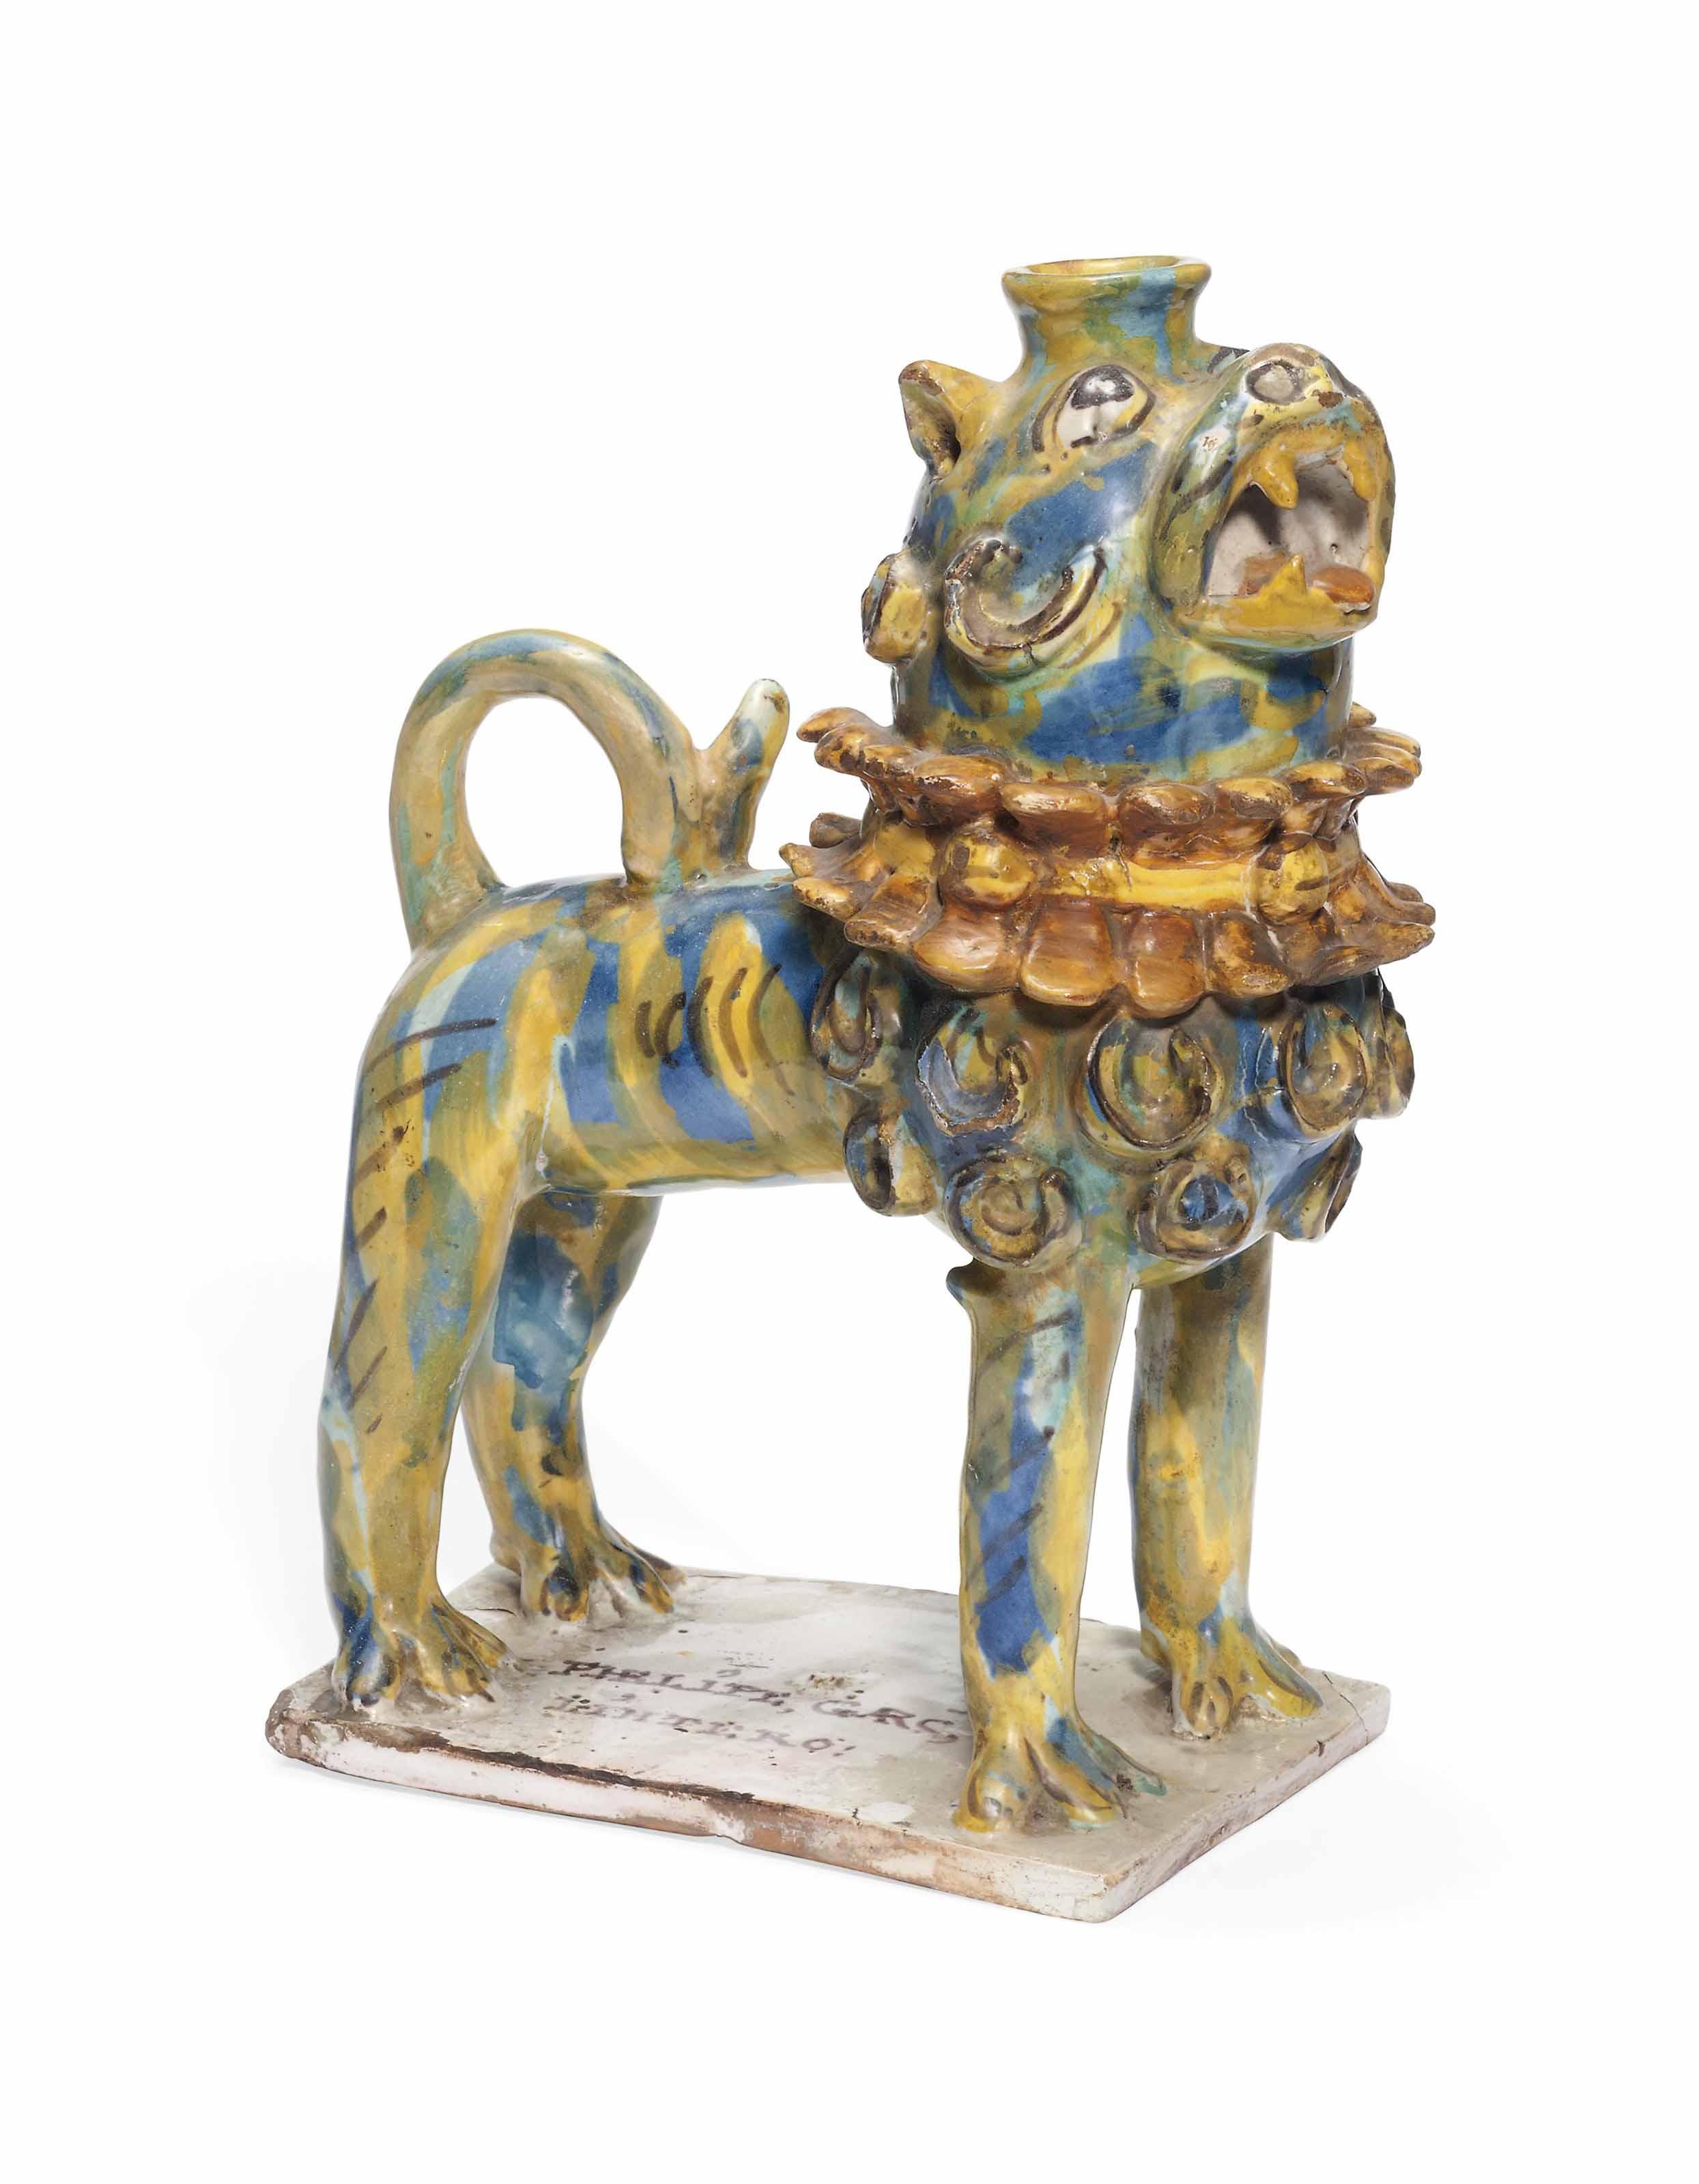 A TALAVERA MODEL OF A LION